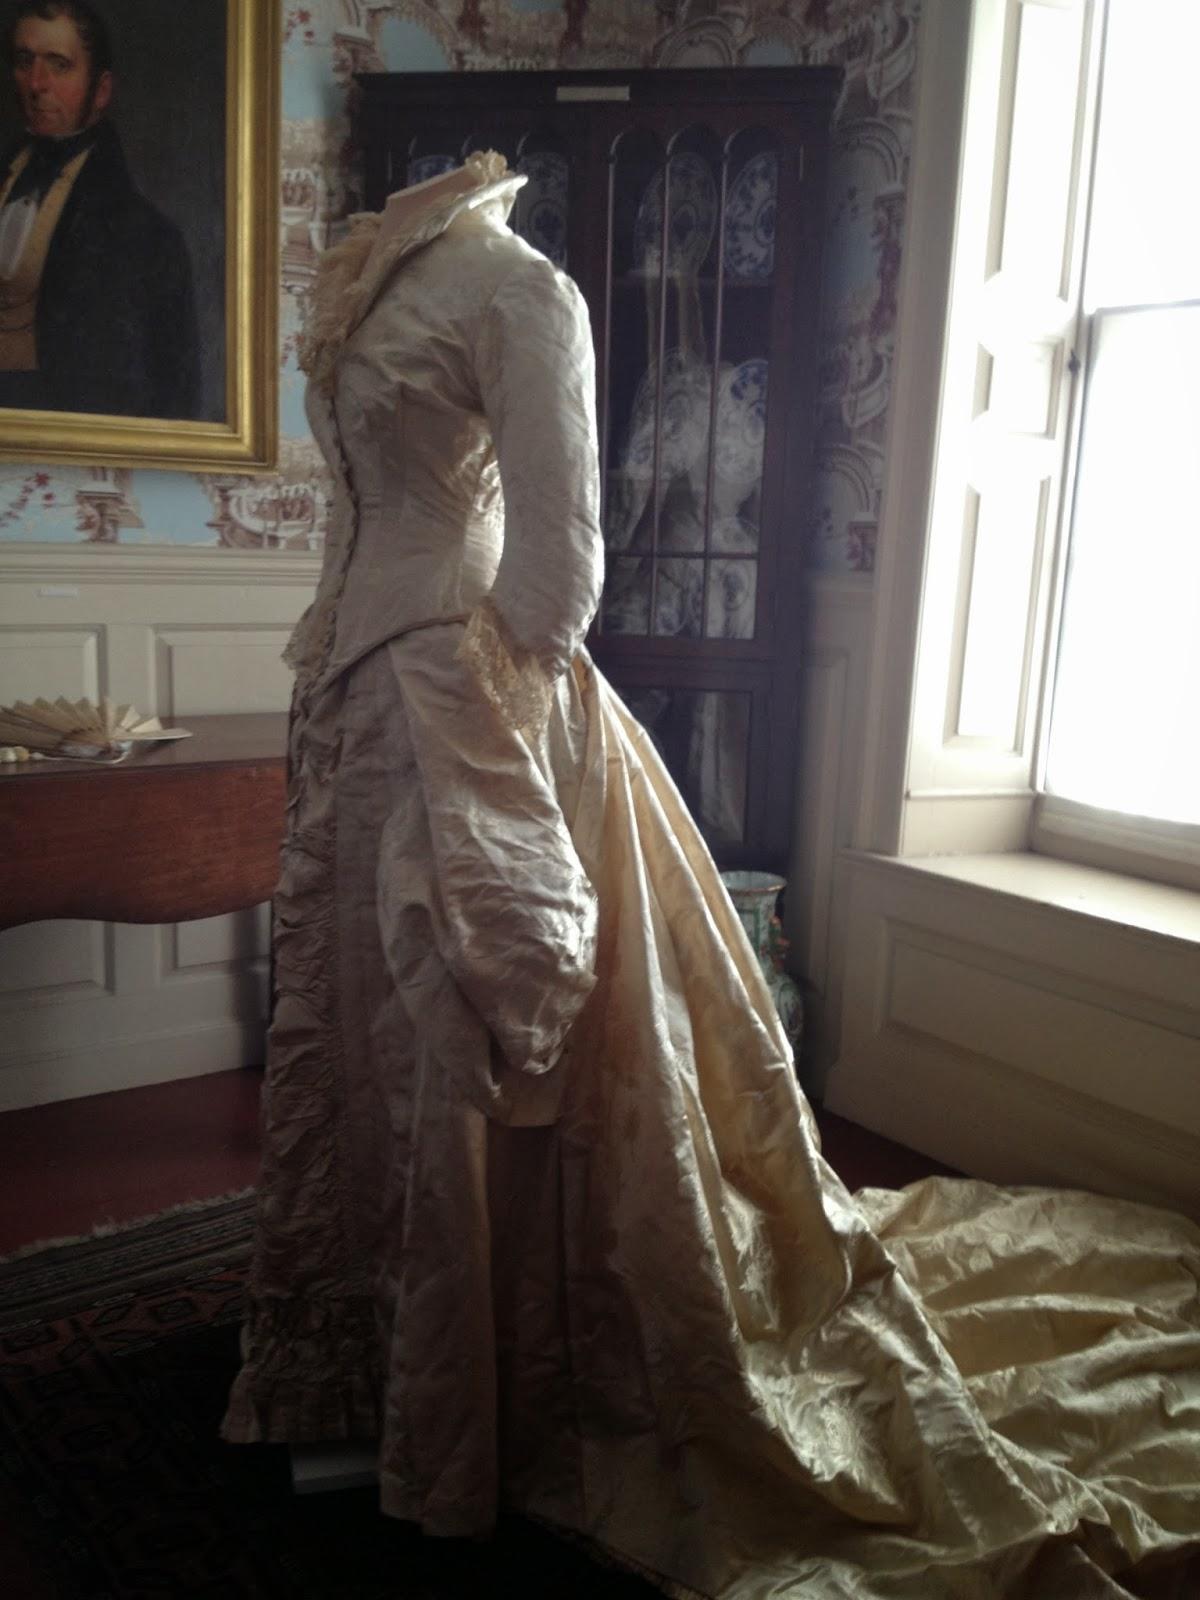 wedding dress preservation portsmouth nh wedding dress preservation Wedding Dress Preservation Portsmouth Nh 62